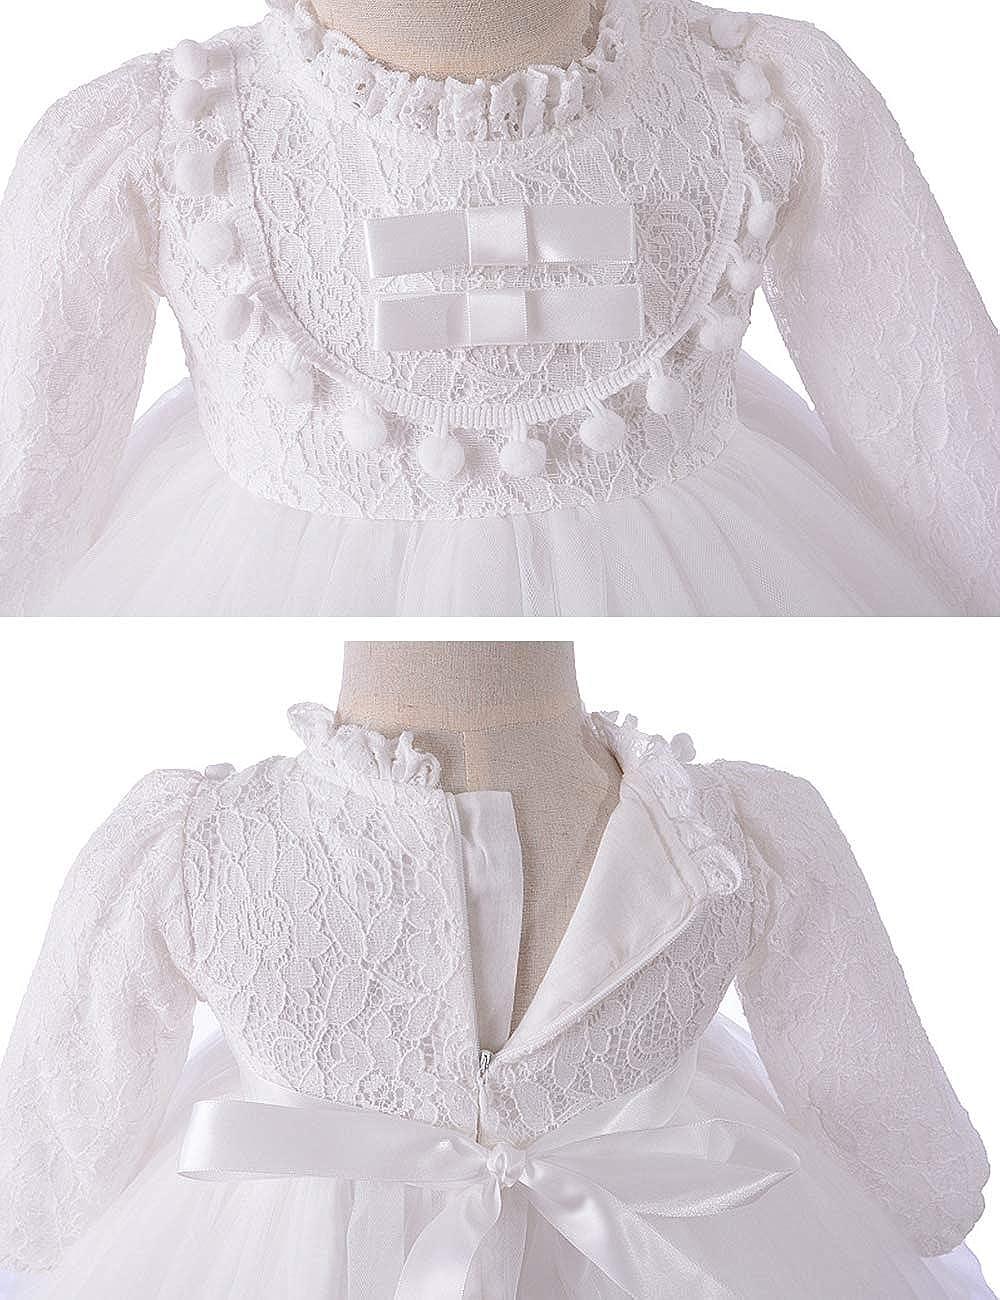 Infant Princess Ruffle Bowknot Long Sleeve Wedding Dresses Zhhlinyuan Baby Girls Fancy Shower Christening Party Tutu Dress with Hat